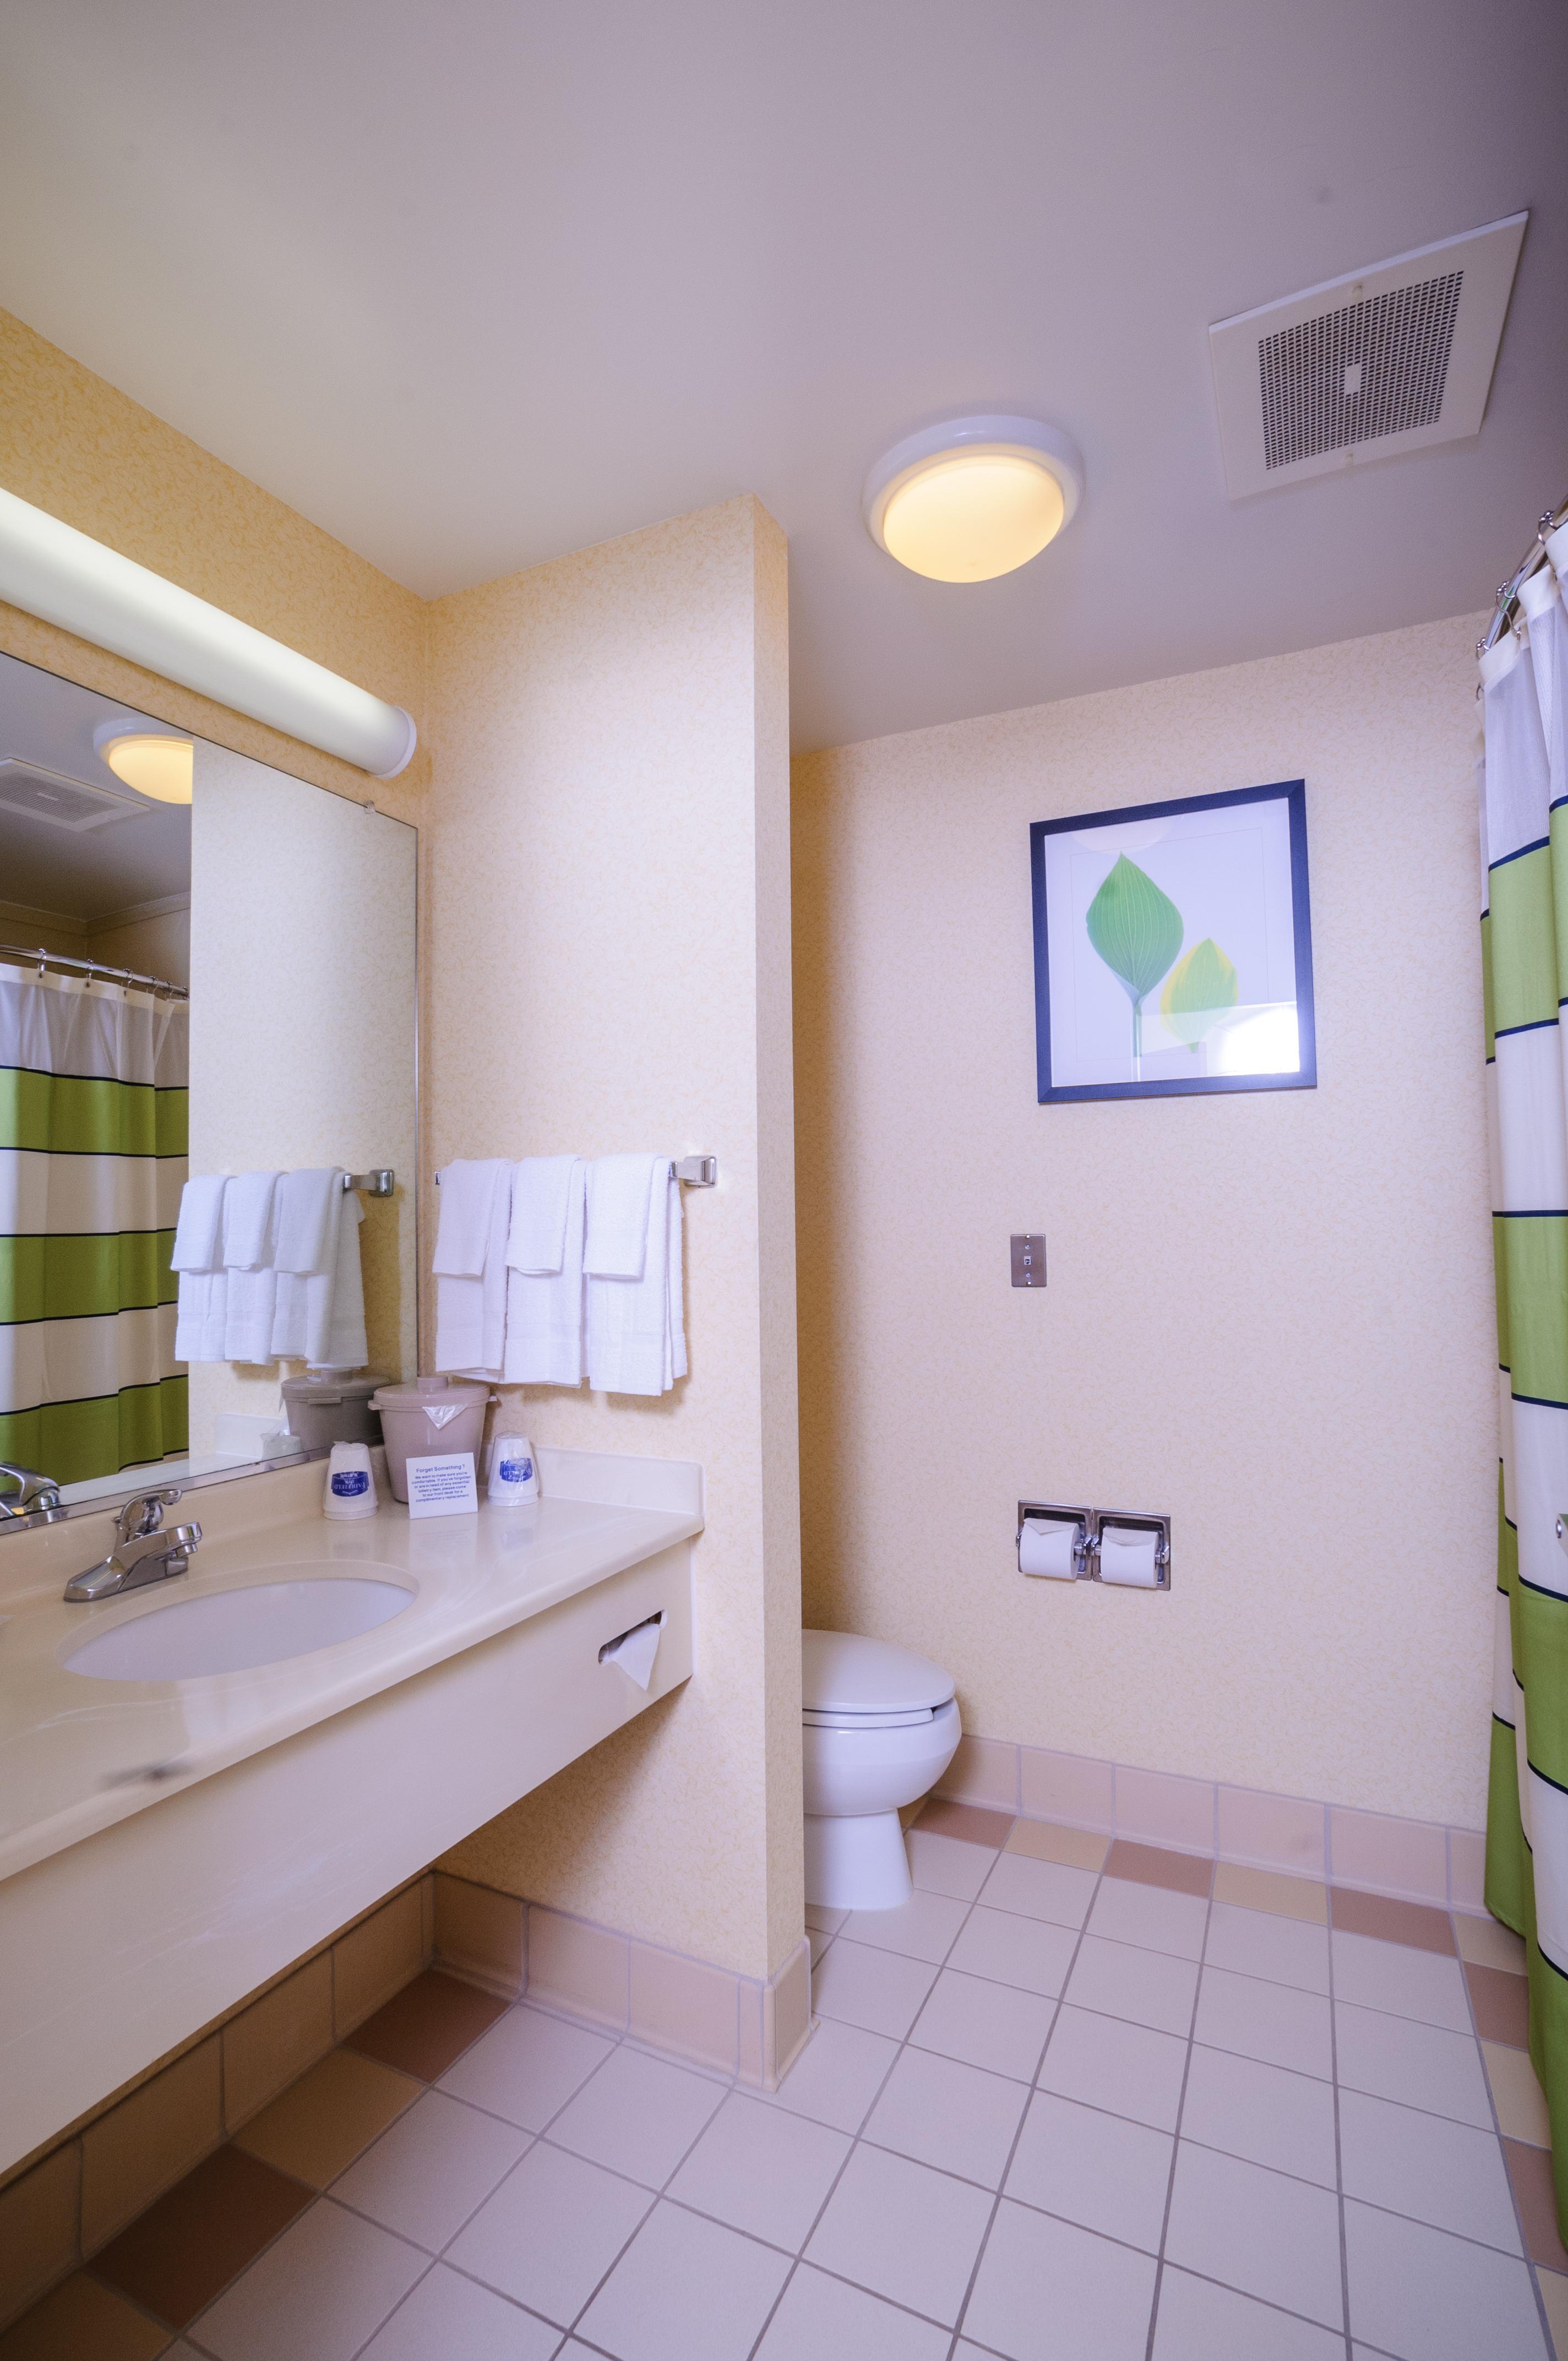 Fairfield Inn & Suites by Marriott Akron South image 17